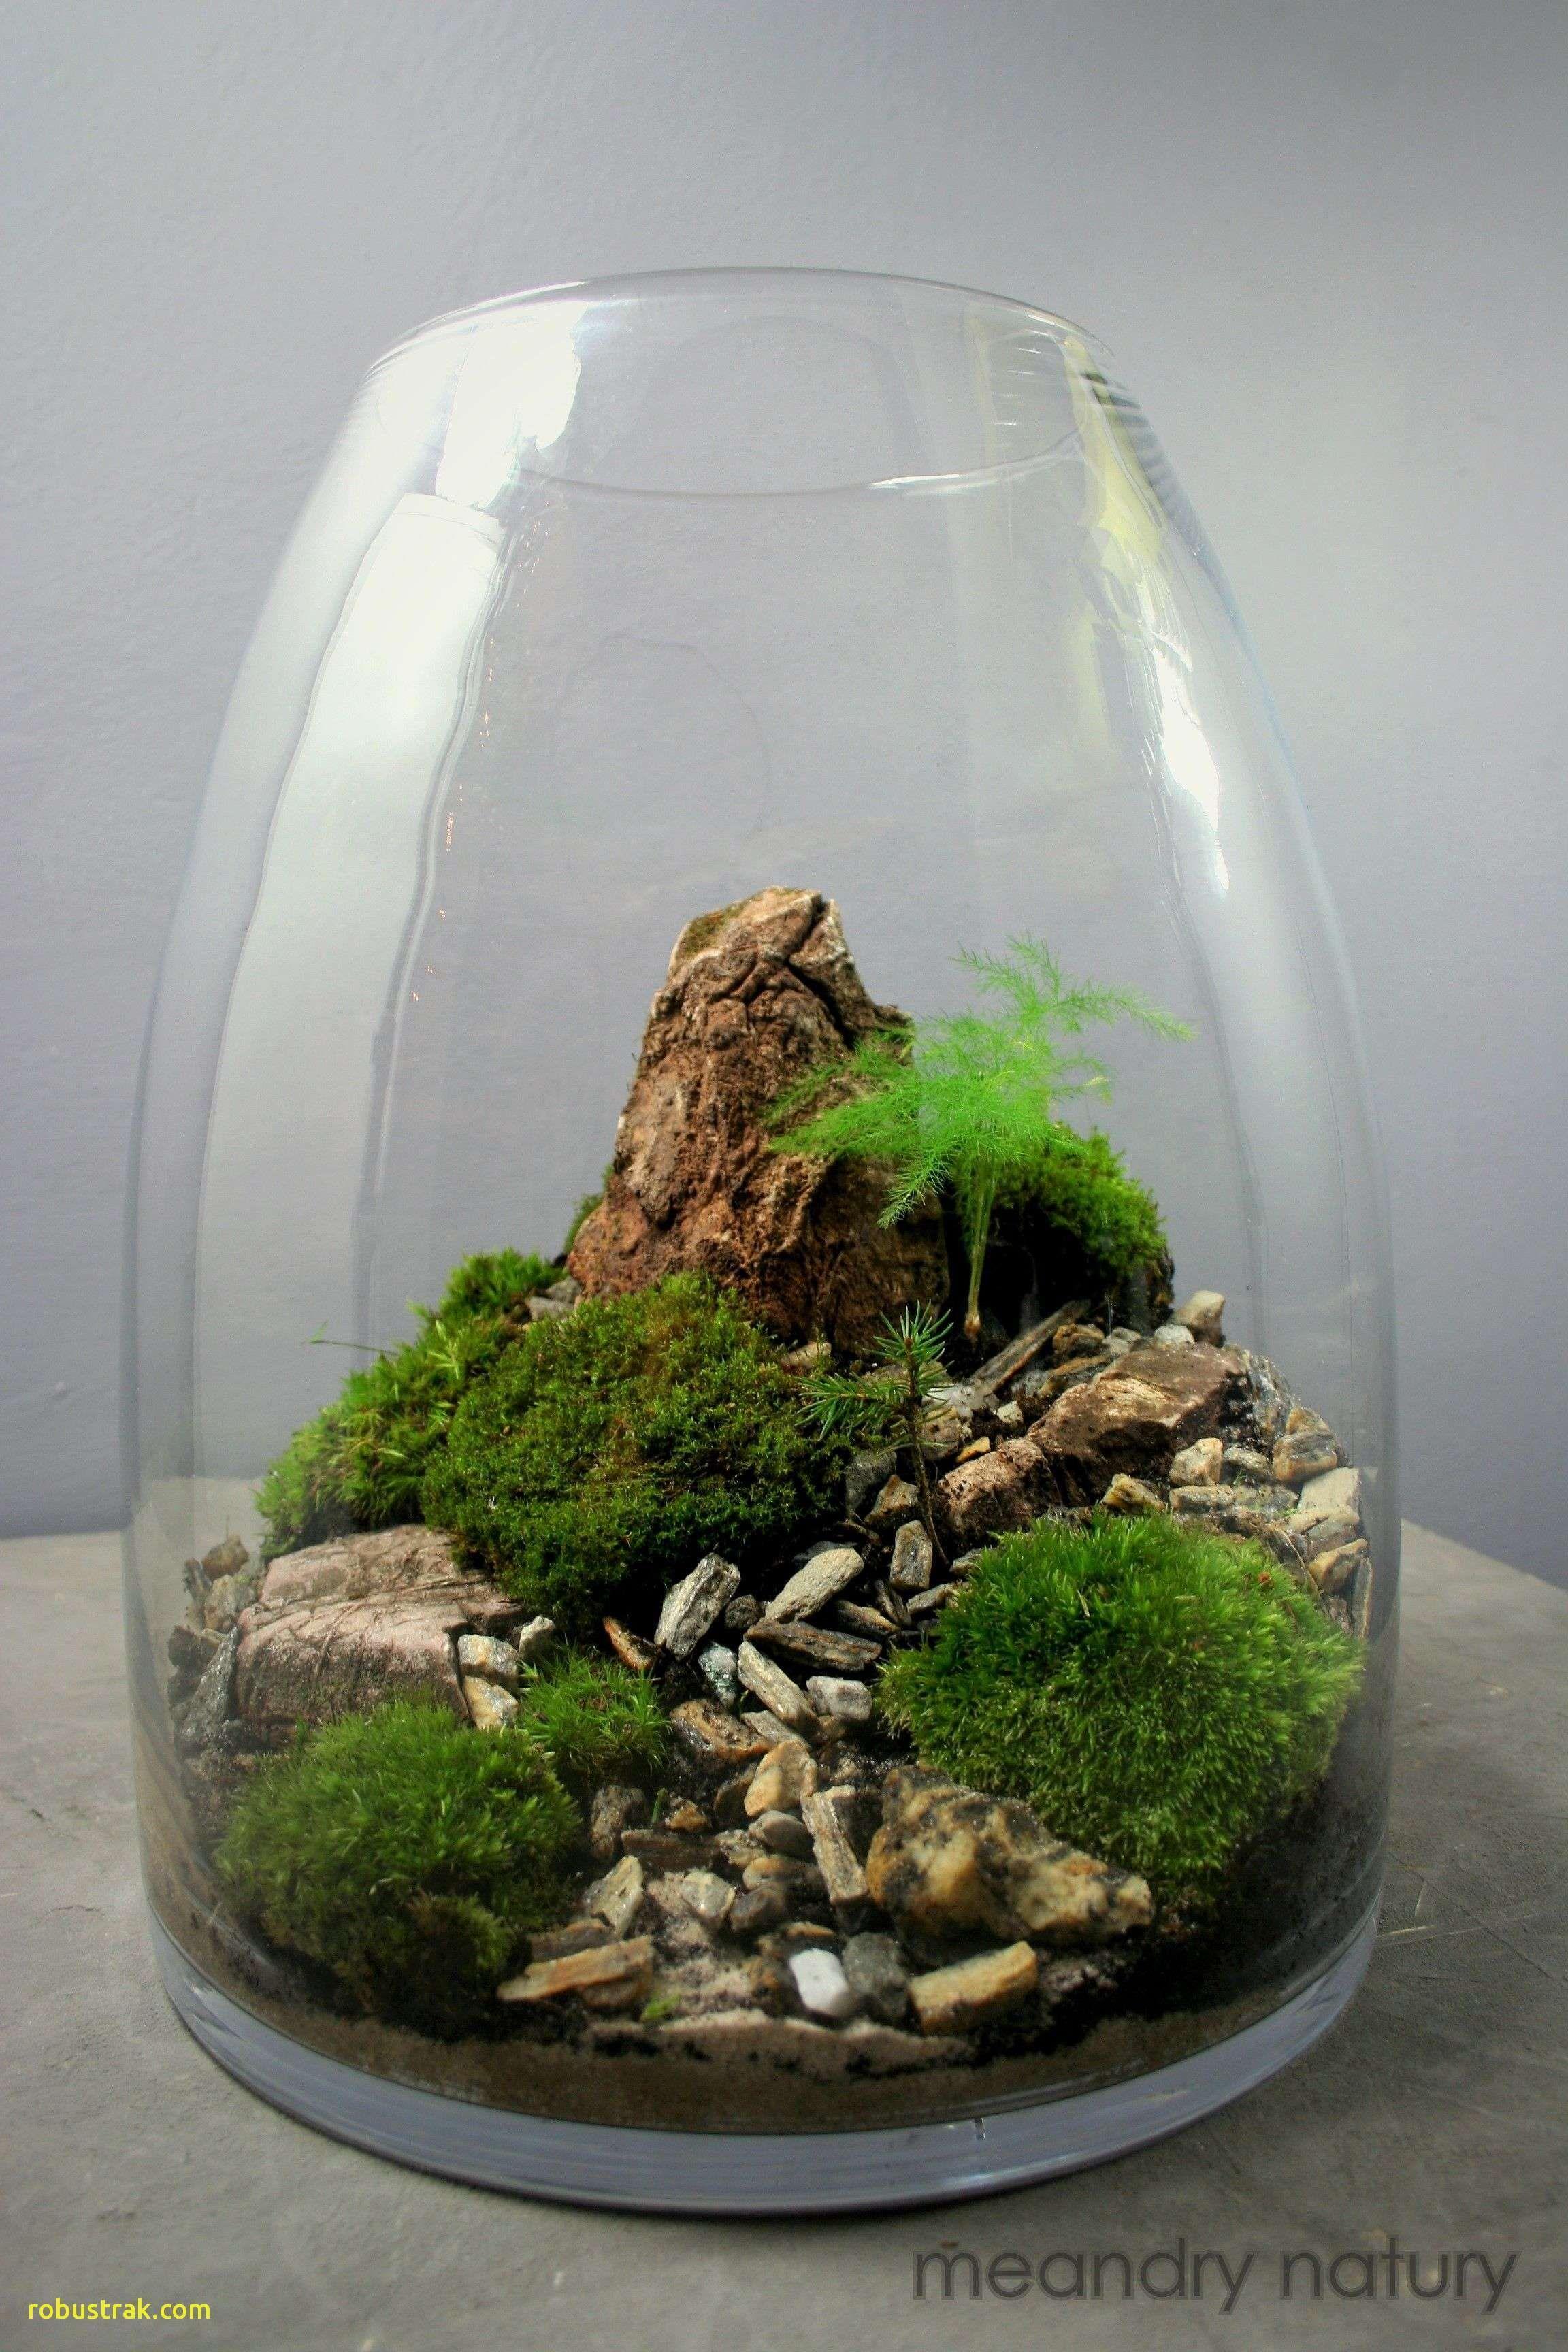 Best Of Air Plants Terrarium, homedecoration